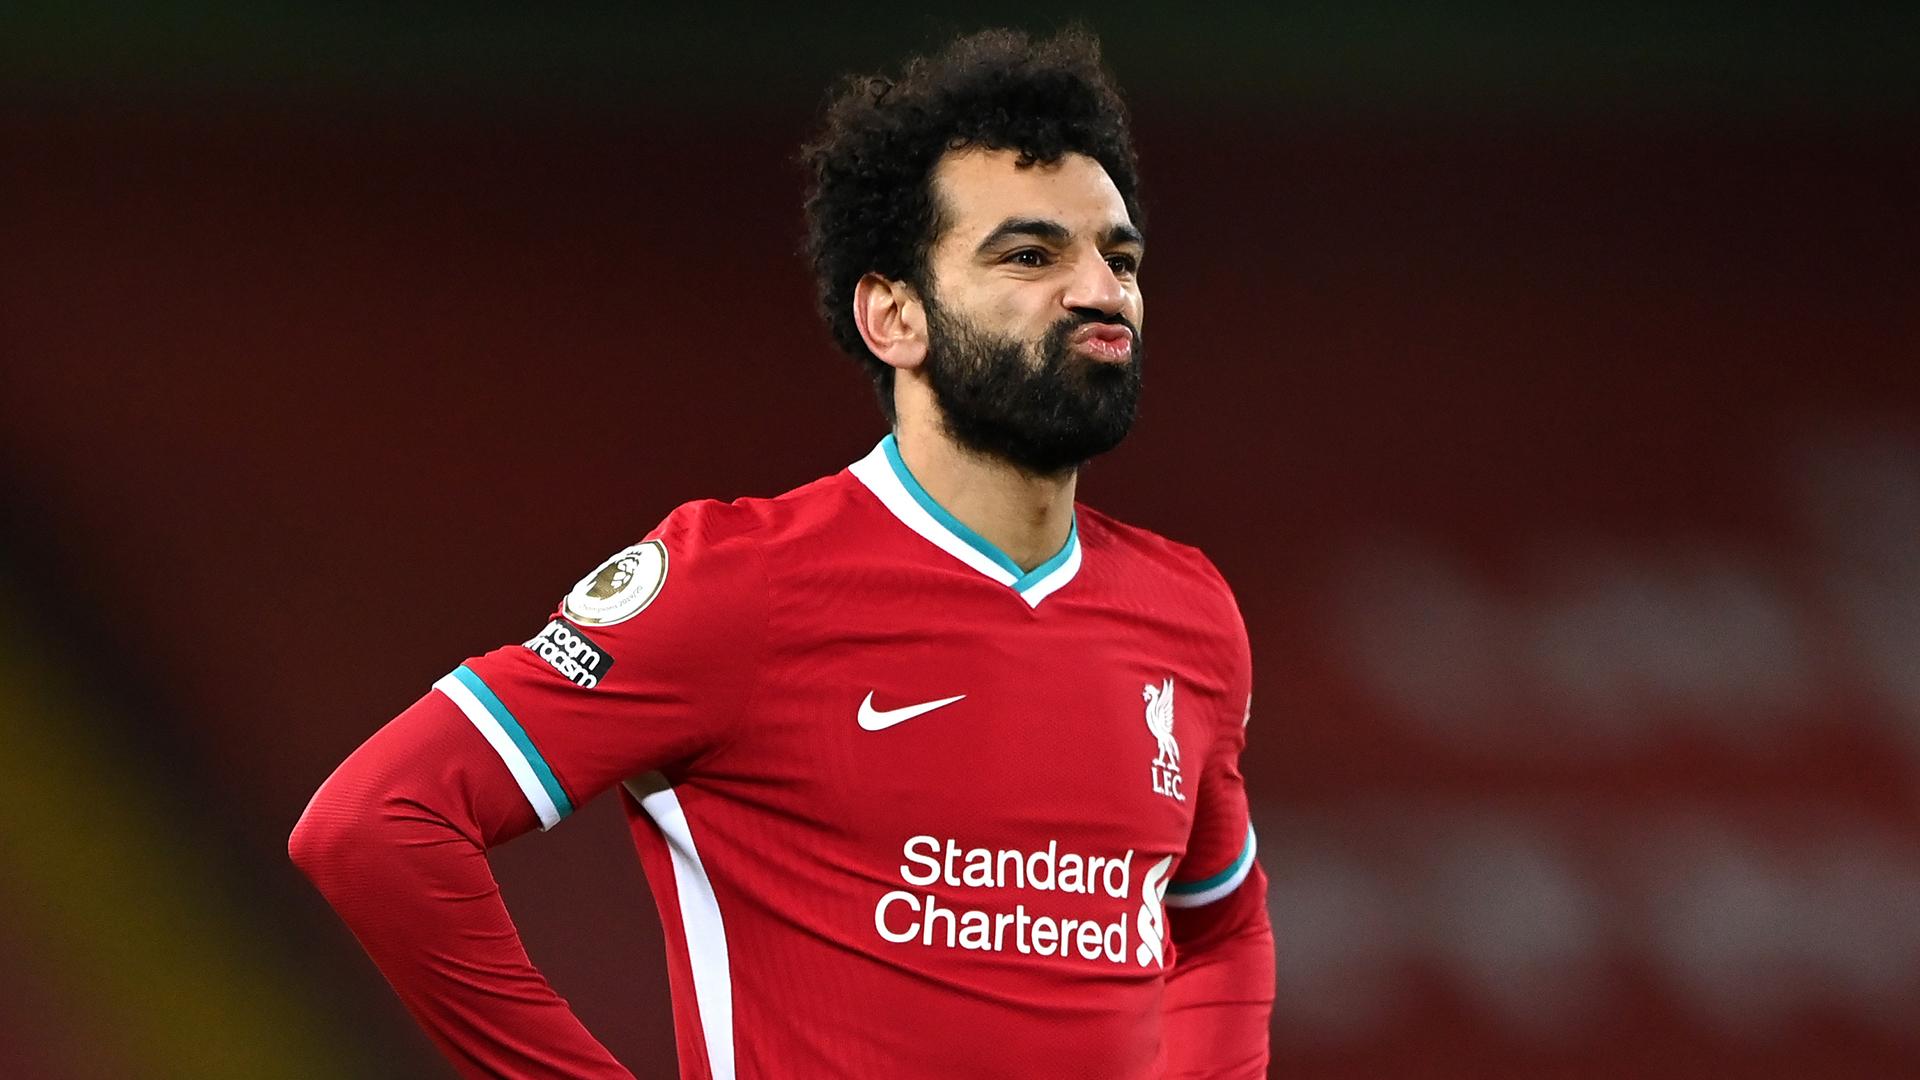 Salah urges Liverpool to ignore 'big picture' of Premier League struggles